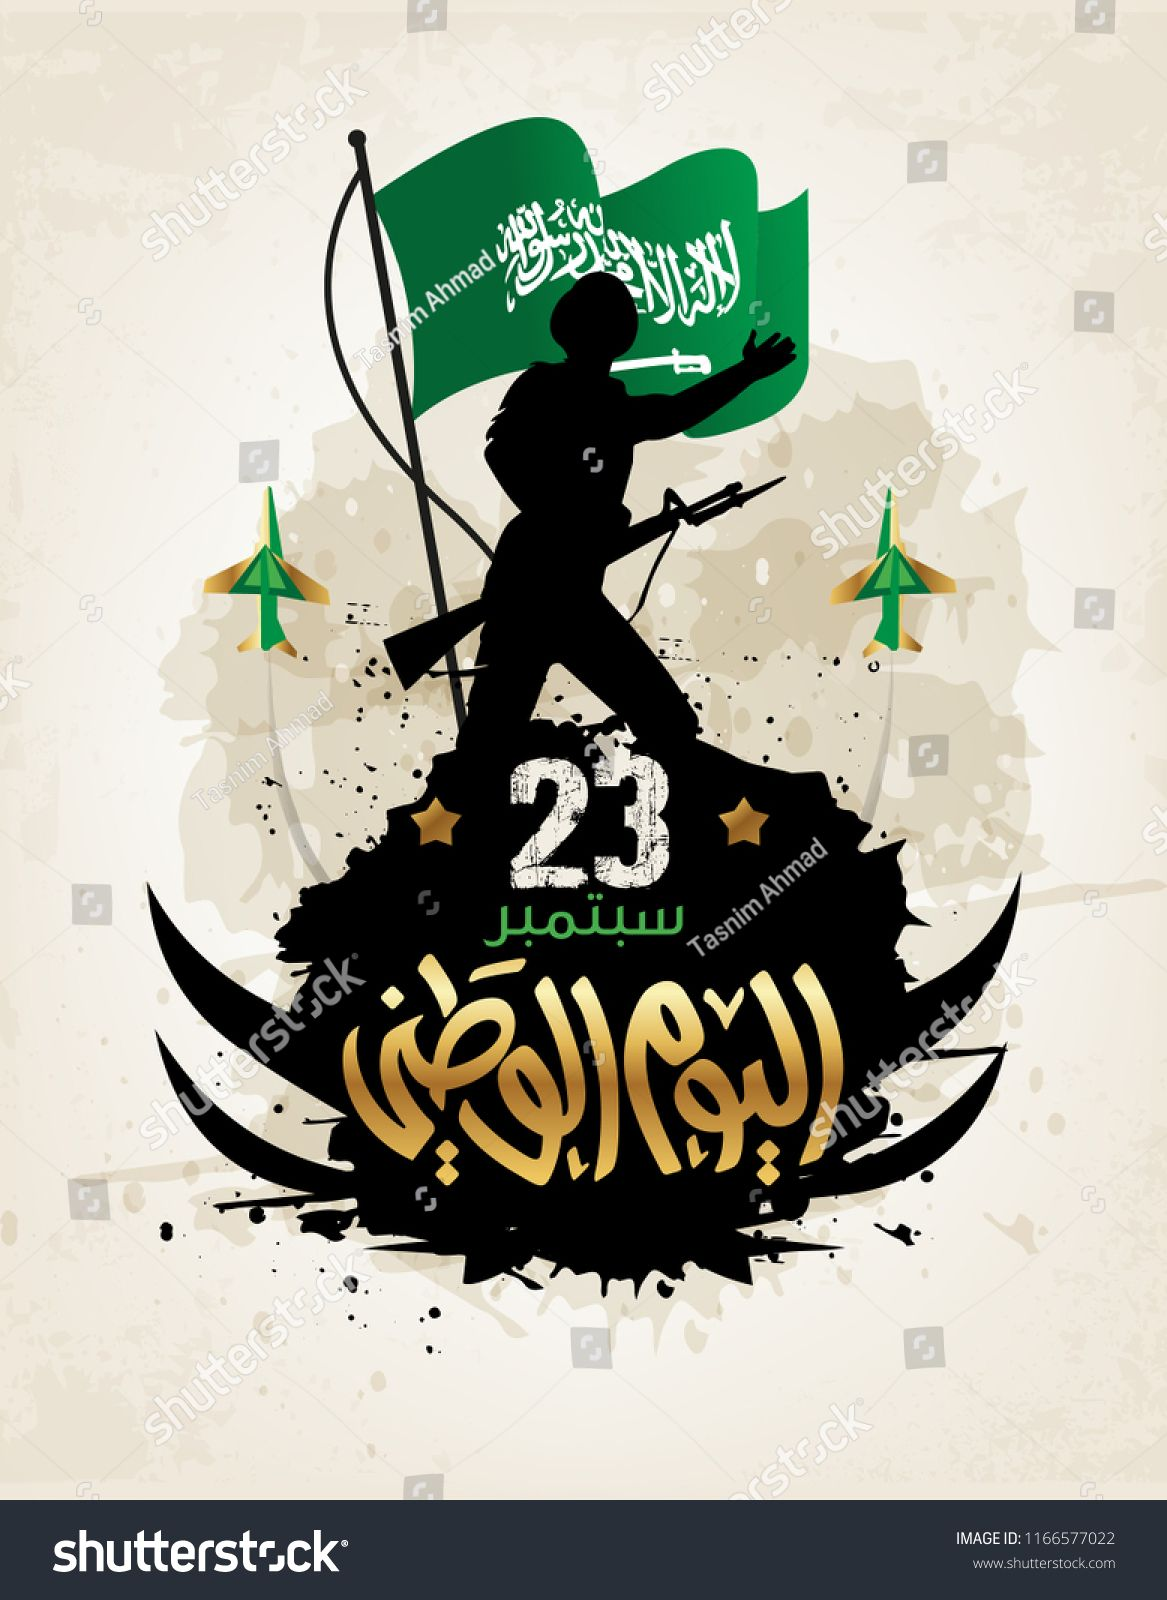 Saudi Arabia National Day In Arabic Calligraphy Style 2 Ad Affiliate National Arabia Saudi Watercolour Texture Background National Day Saudi National Day